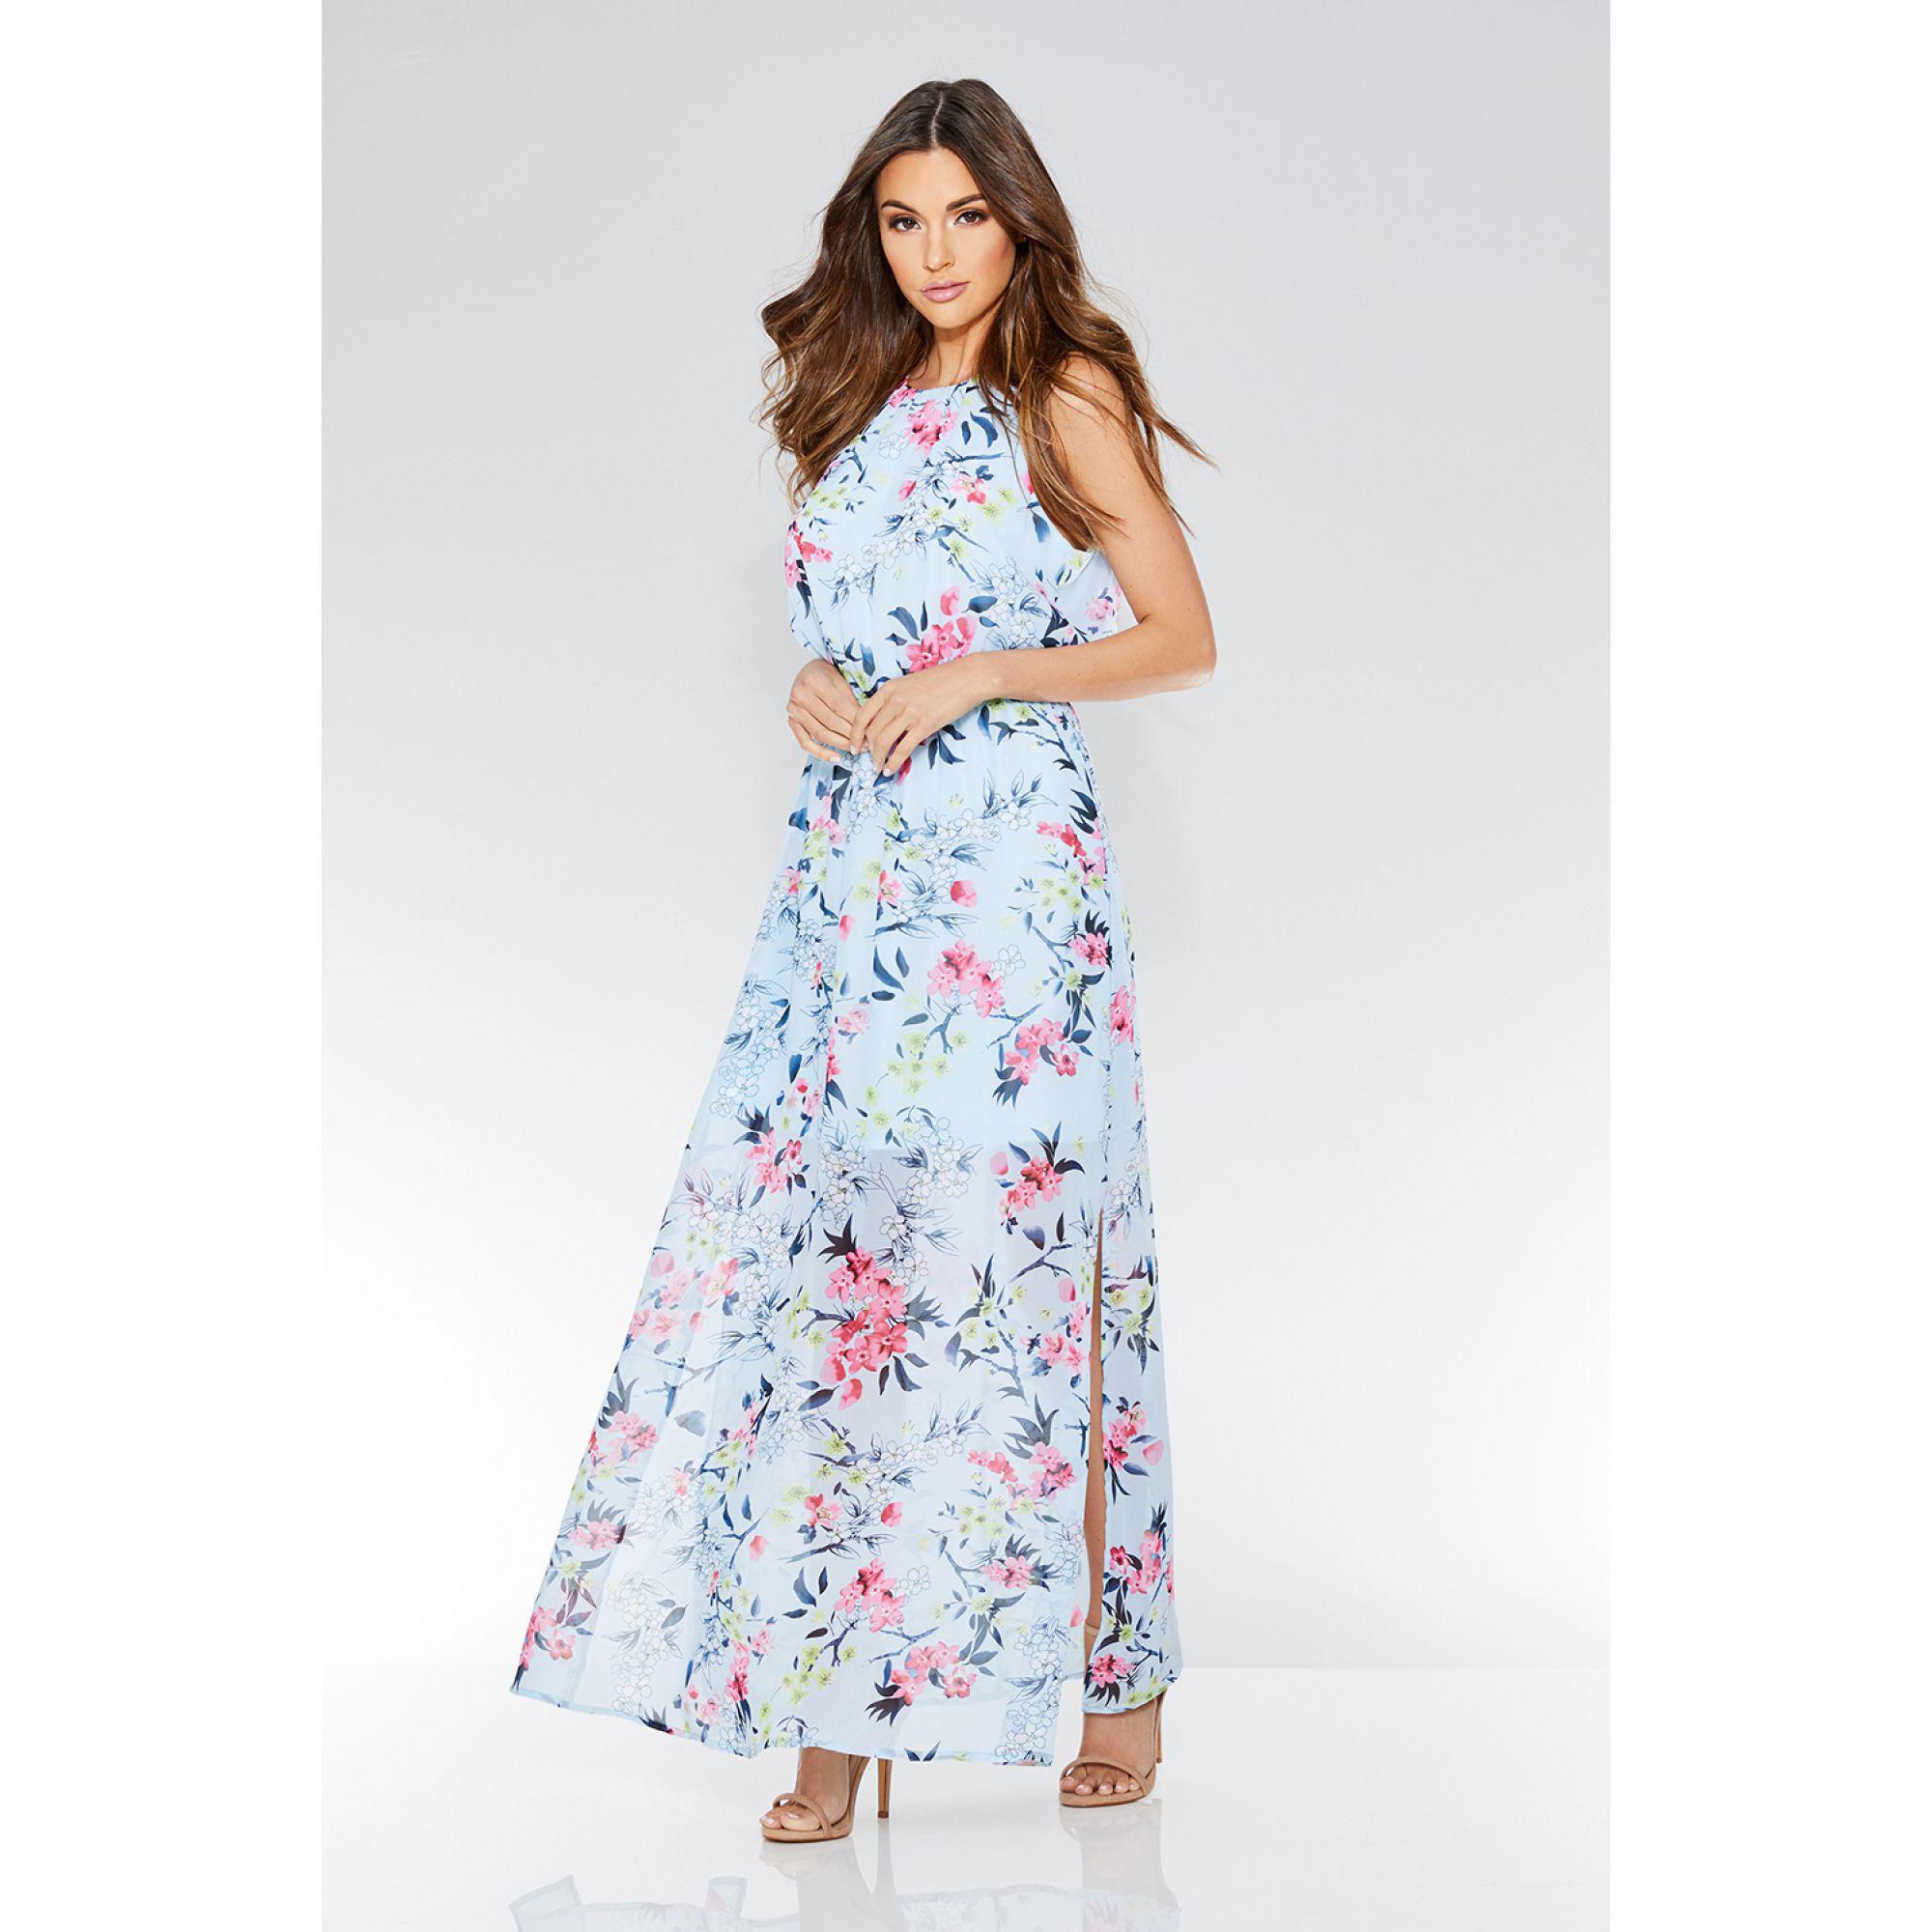 818592807be Quiz. Women s Blue Floral Print Chiffon High Neck Sleeveless Maxi Dress